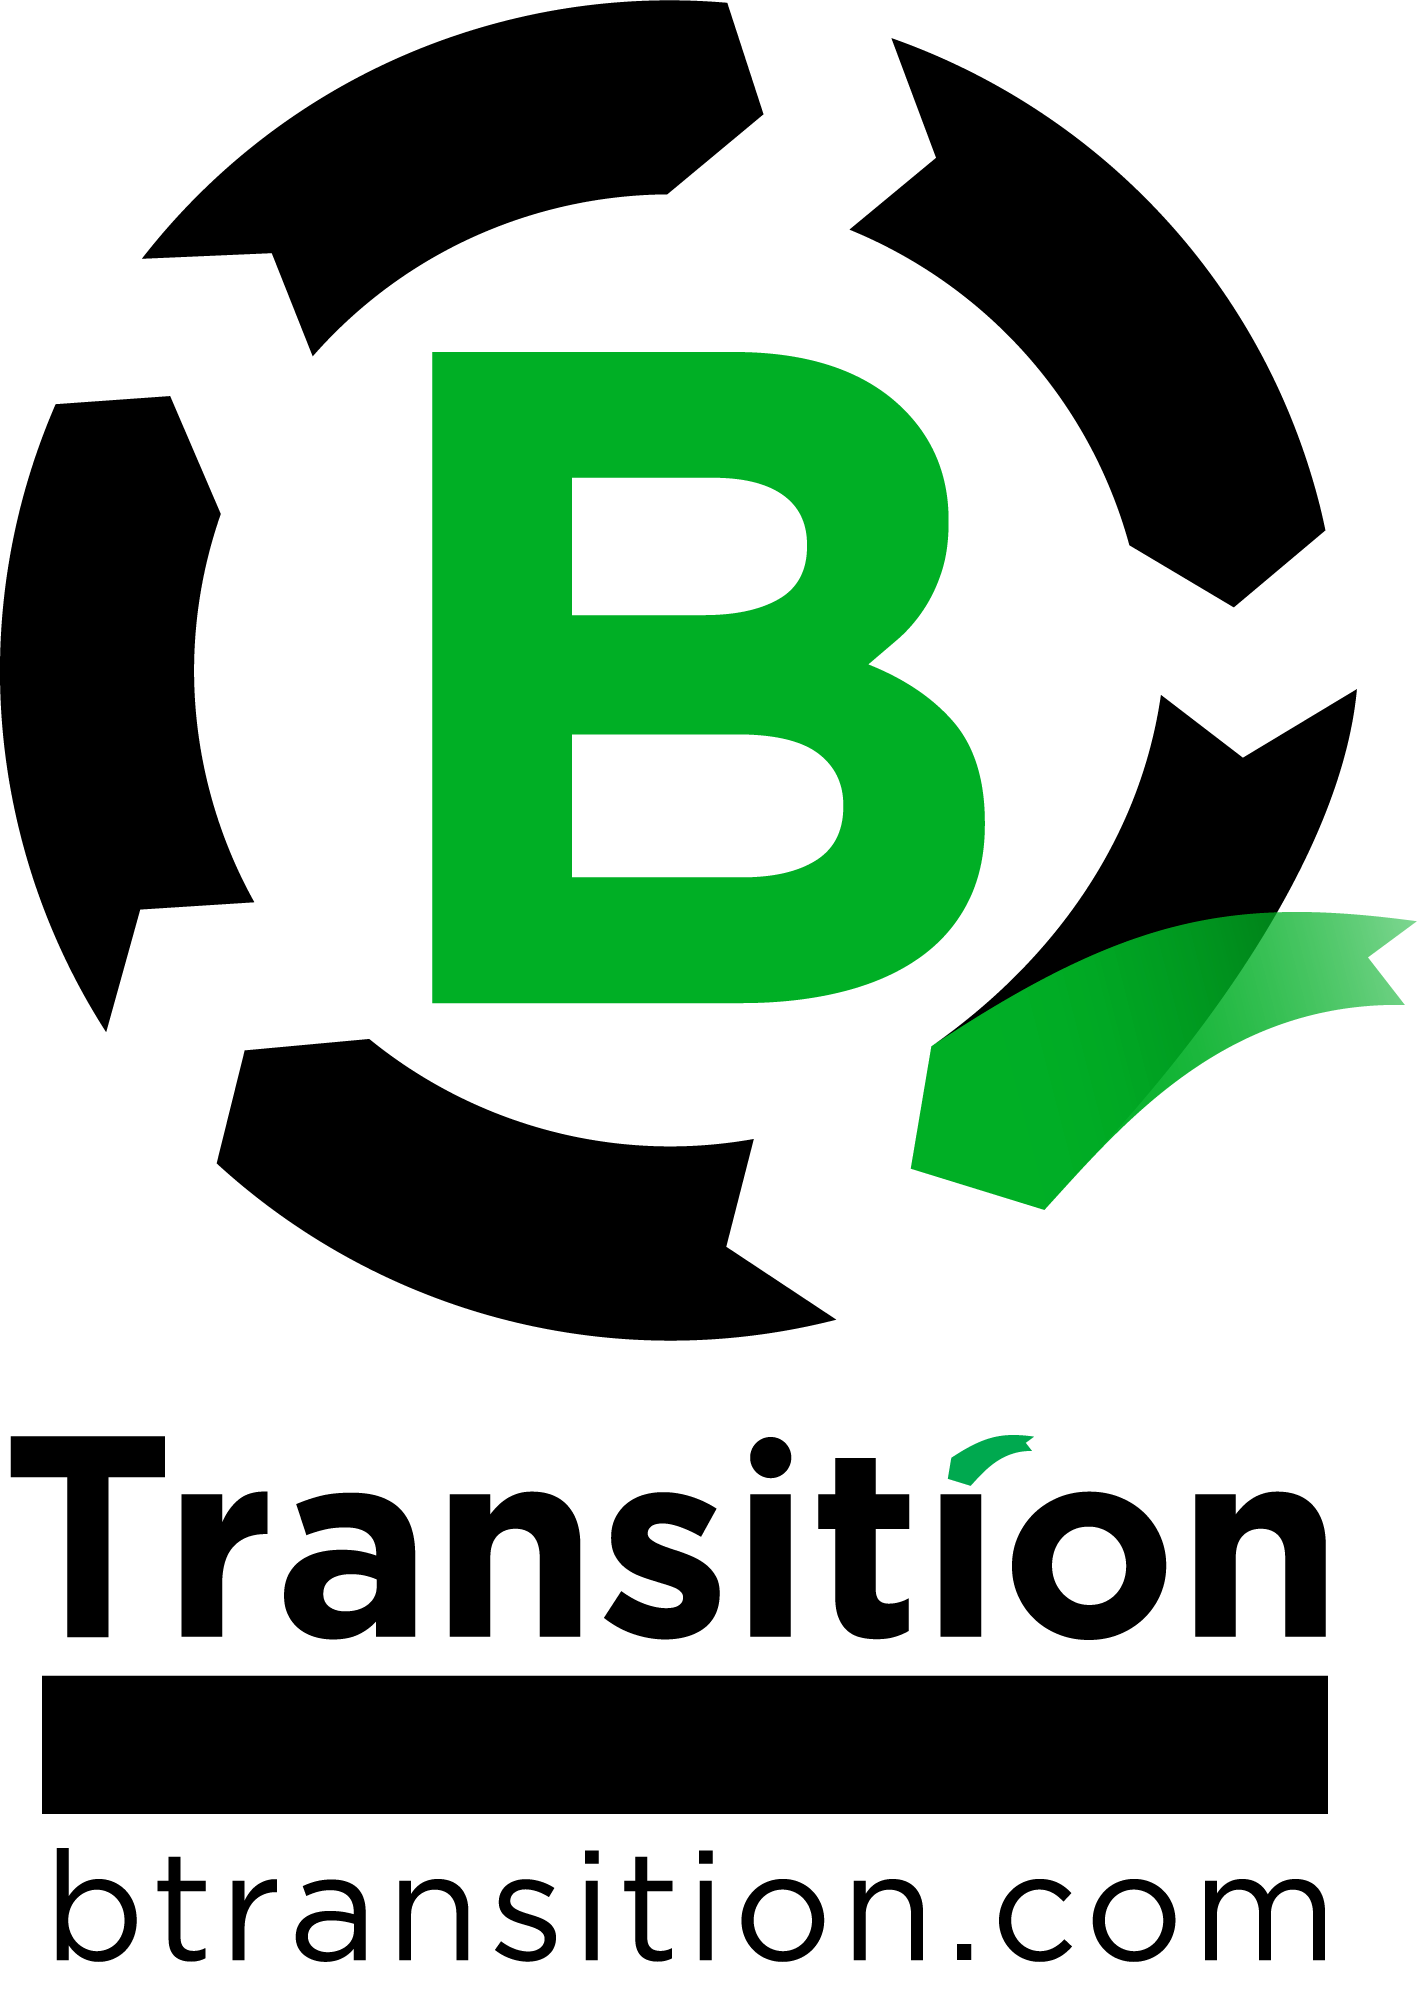 B Transition